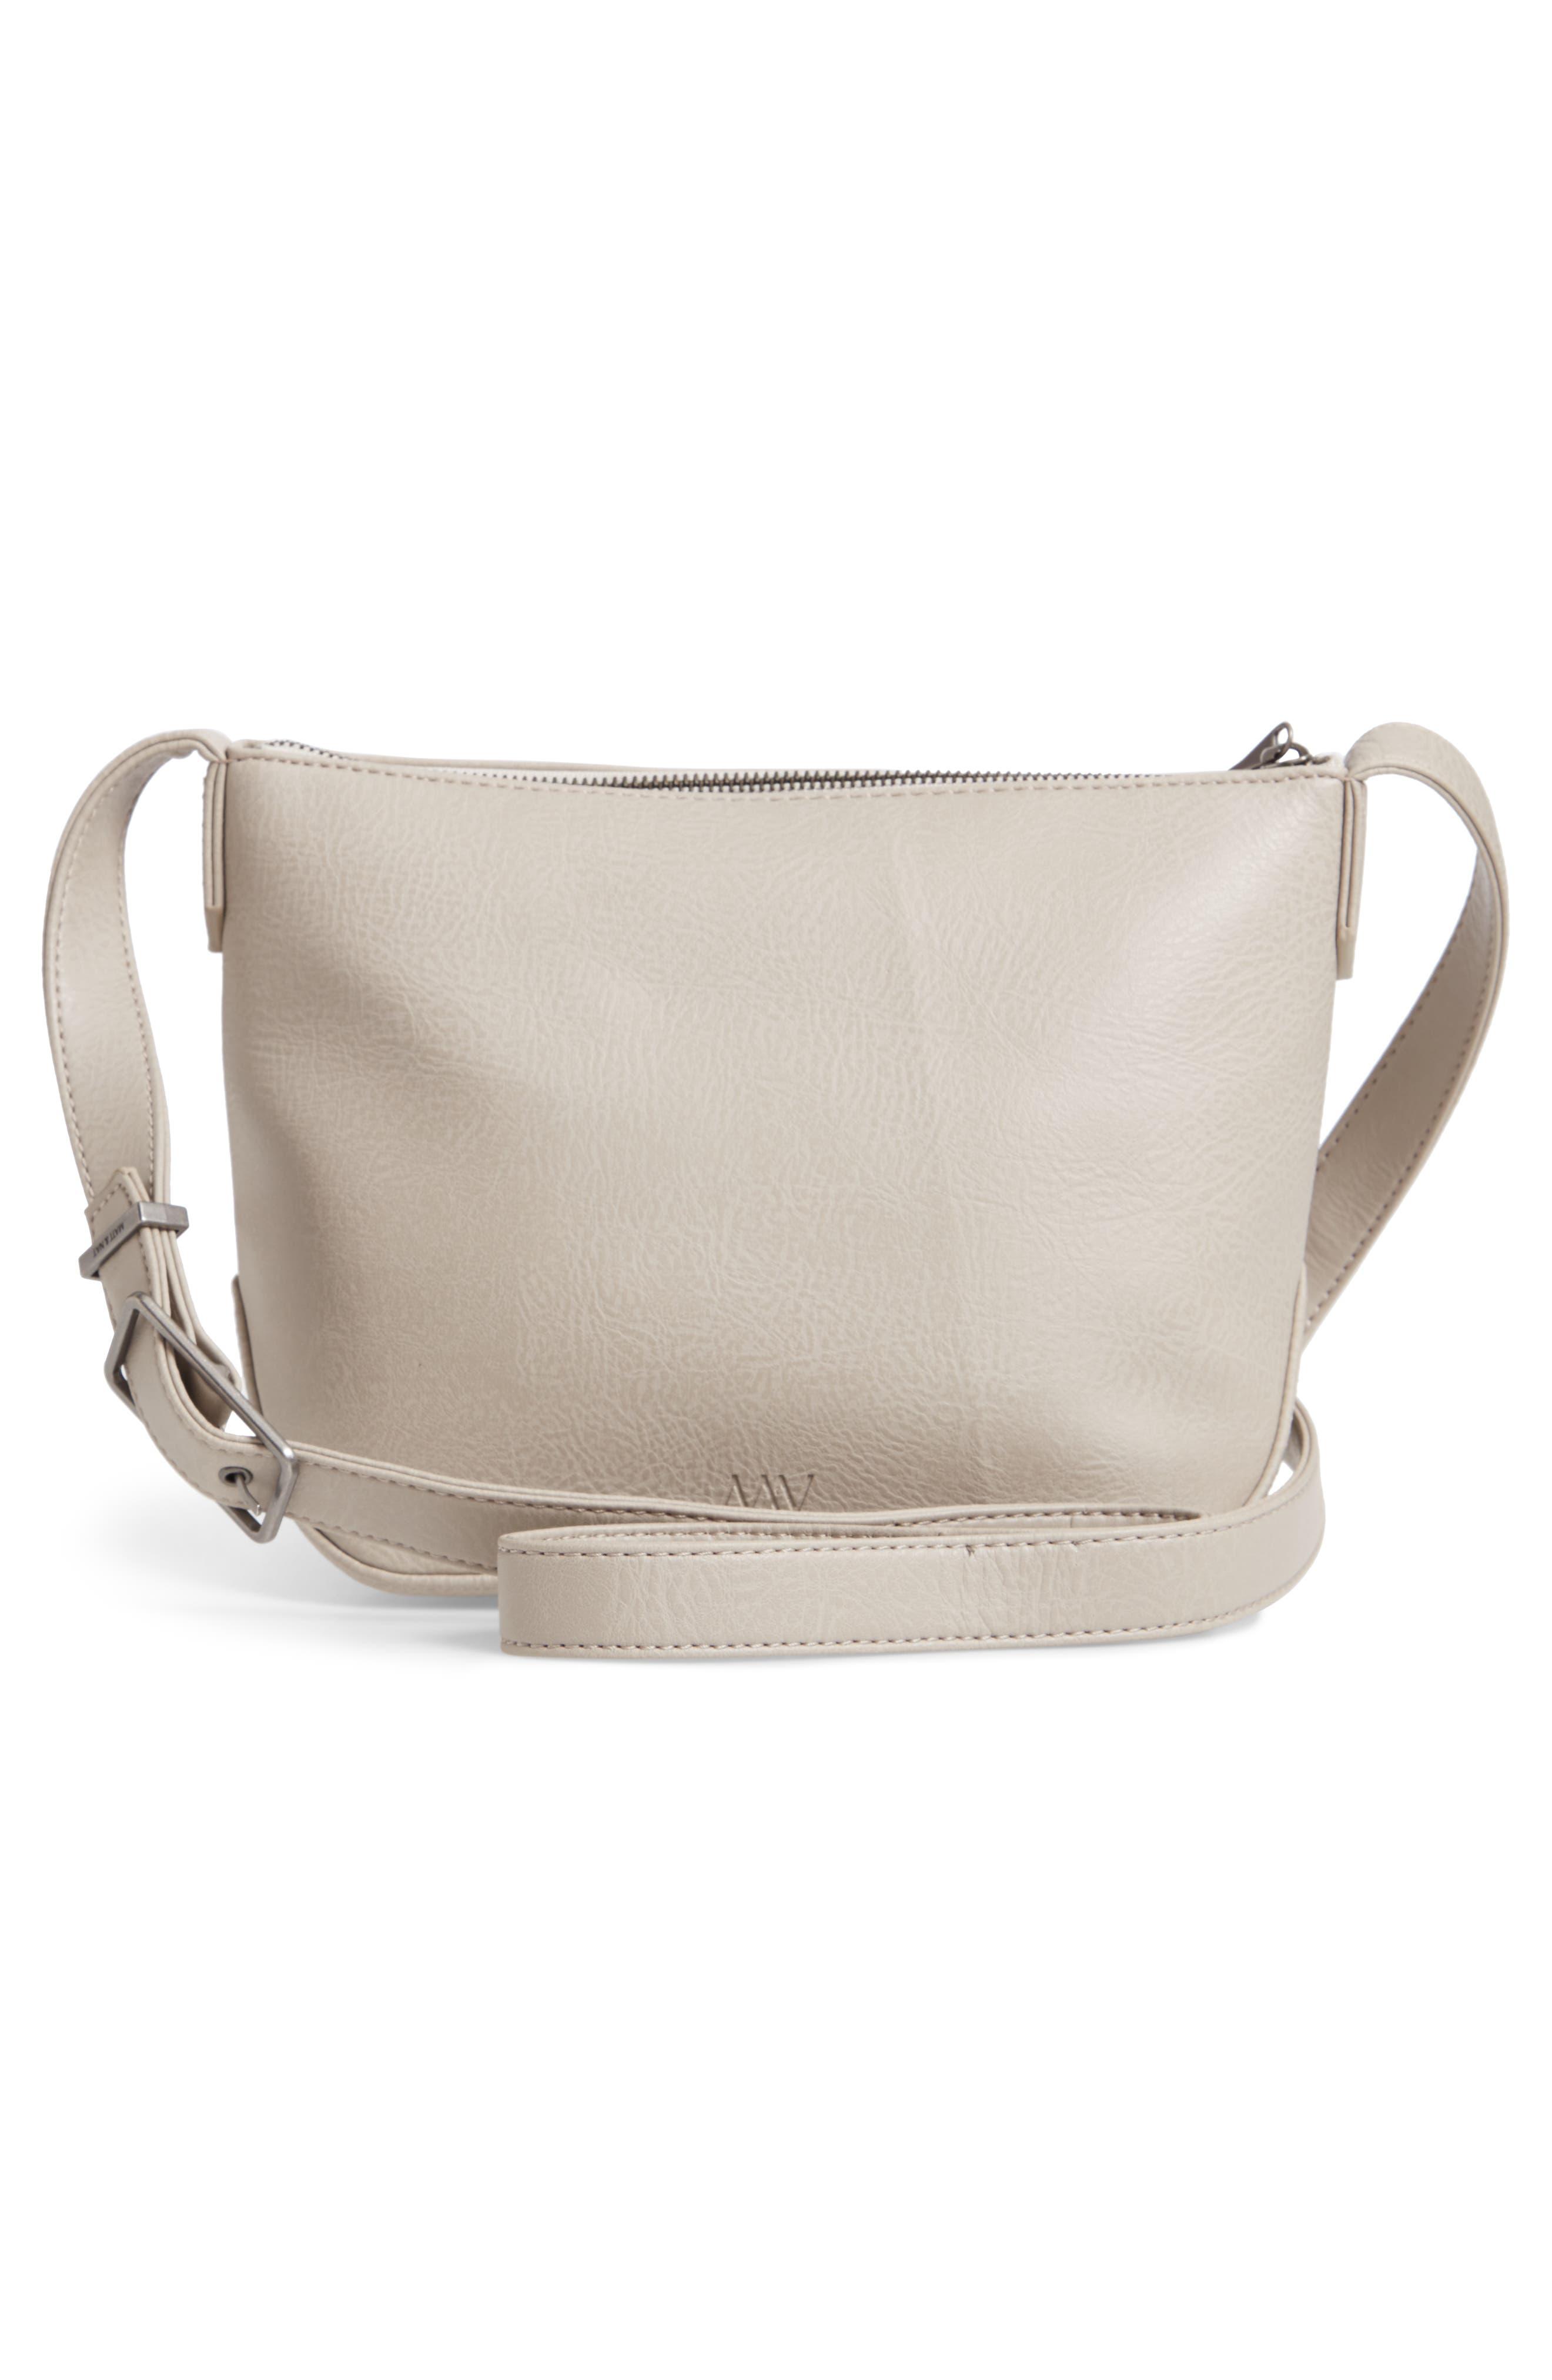 Large Sam Faux Leather Crossbody Bag,                             Alternate thumbnail 3, color,                             050